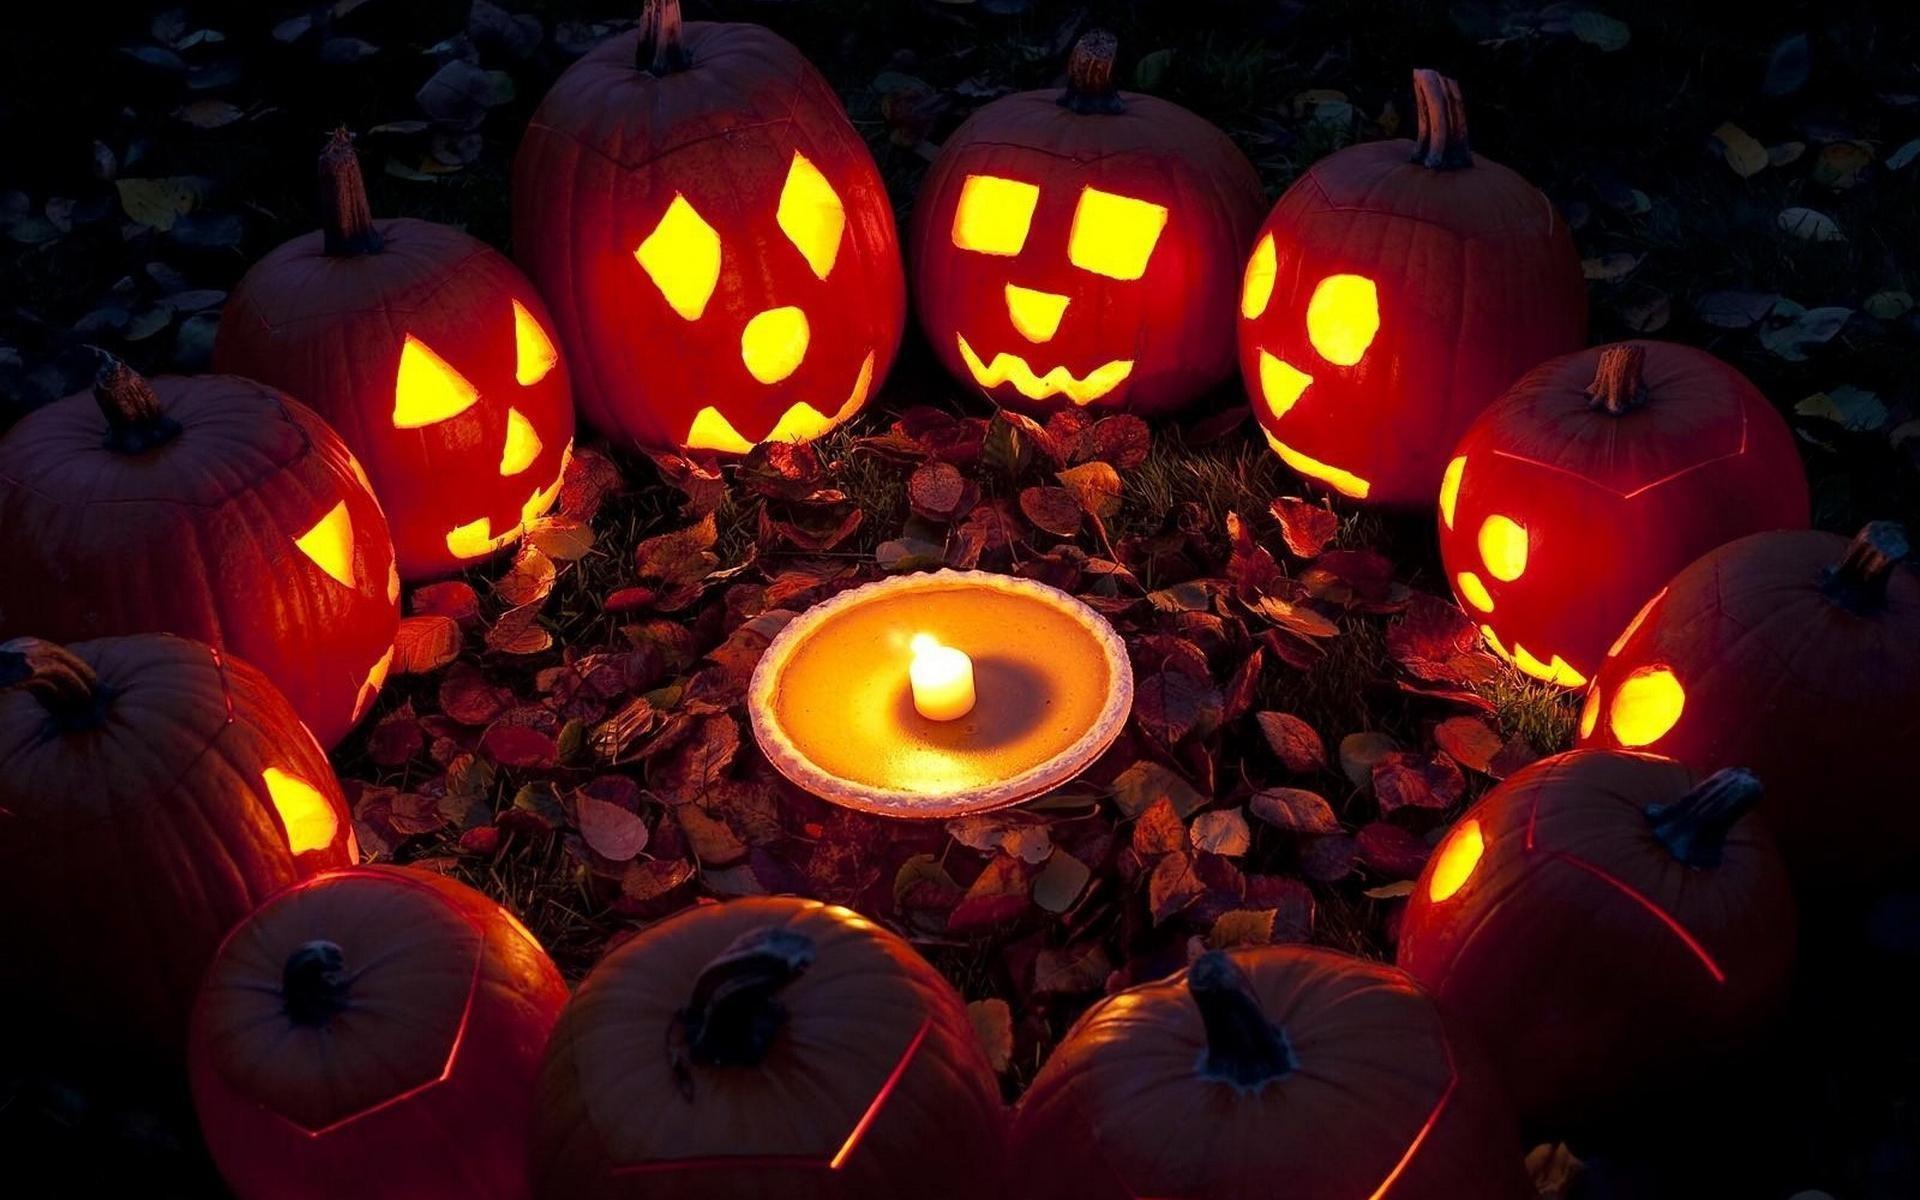 1920x1200 Halloween Pumpkin Desktop Wallpaper · Download · HD ...